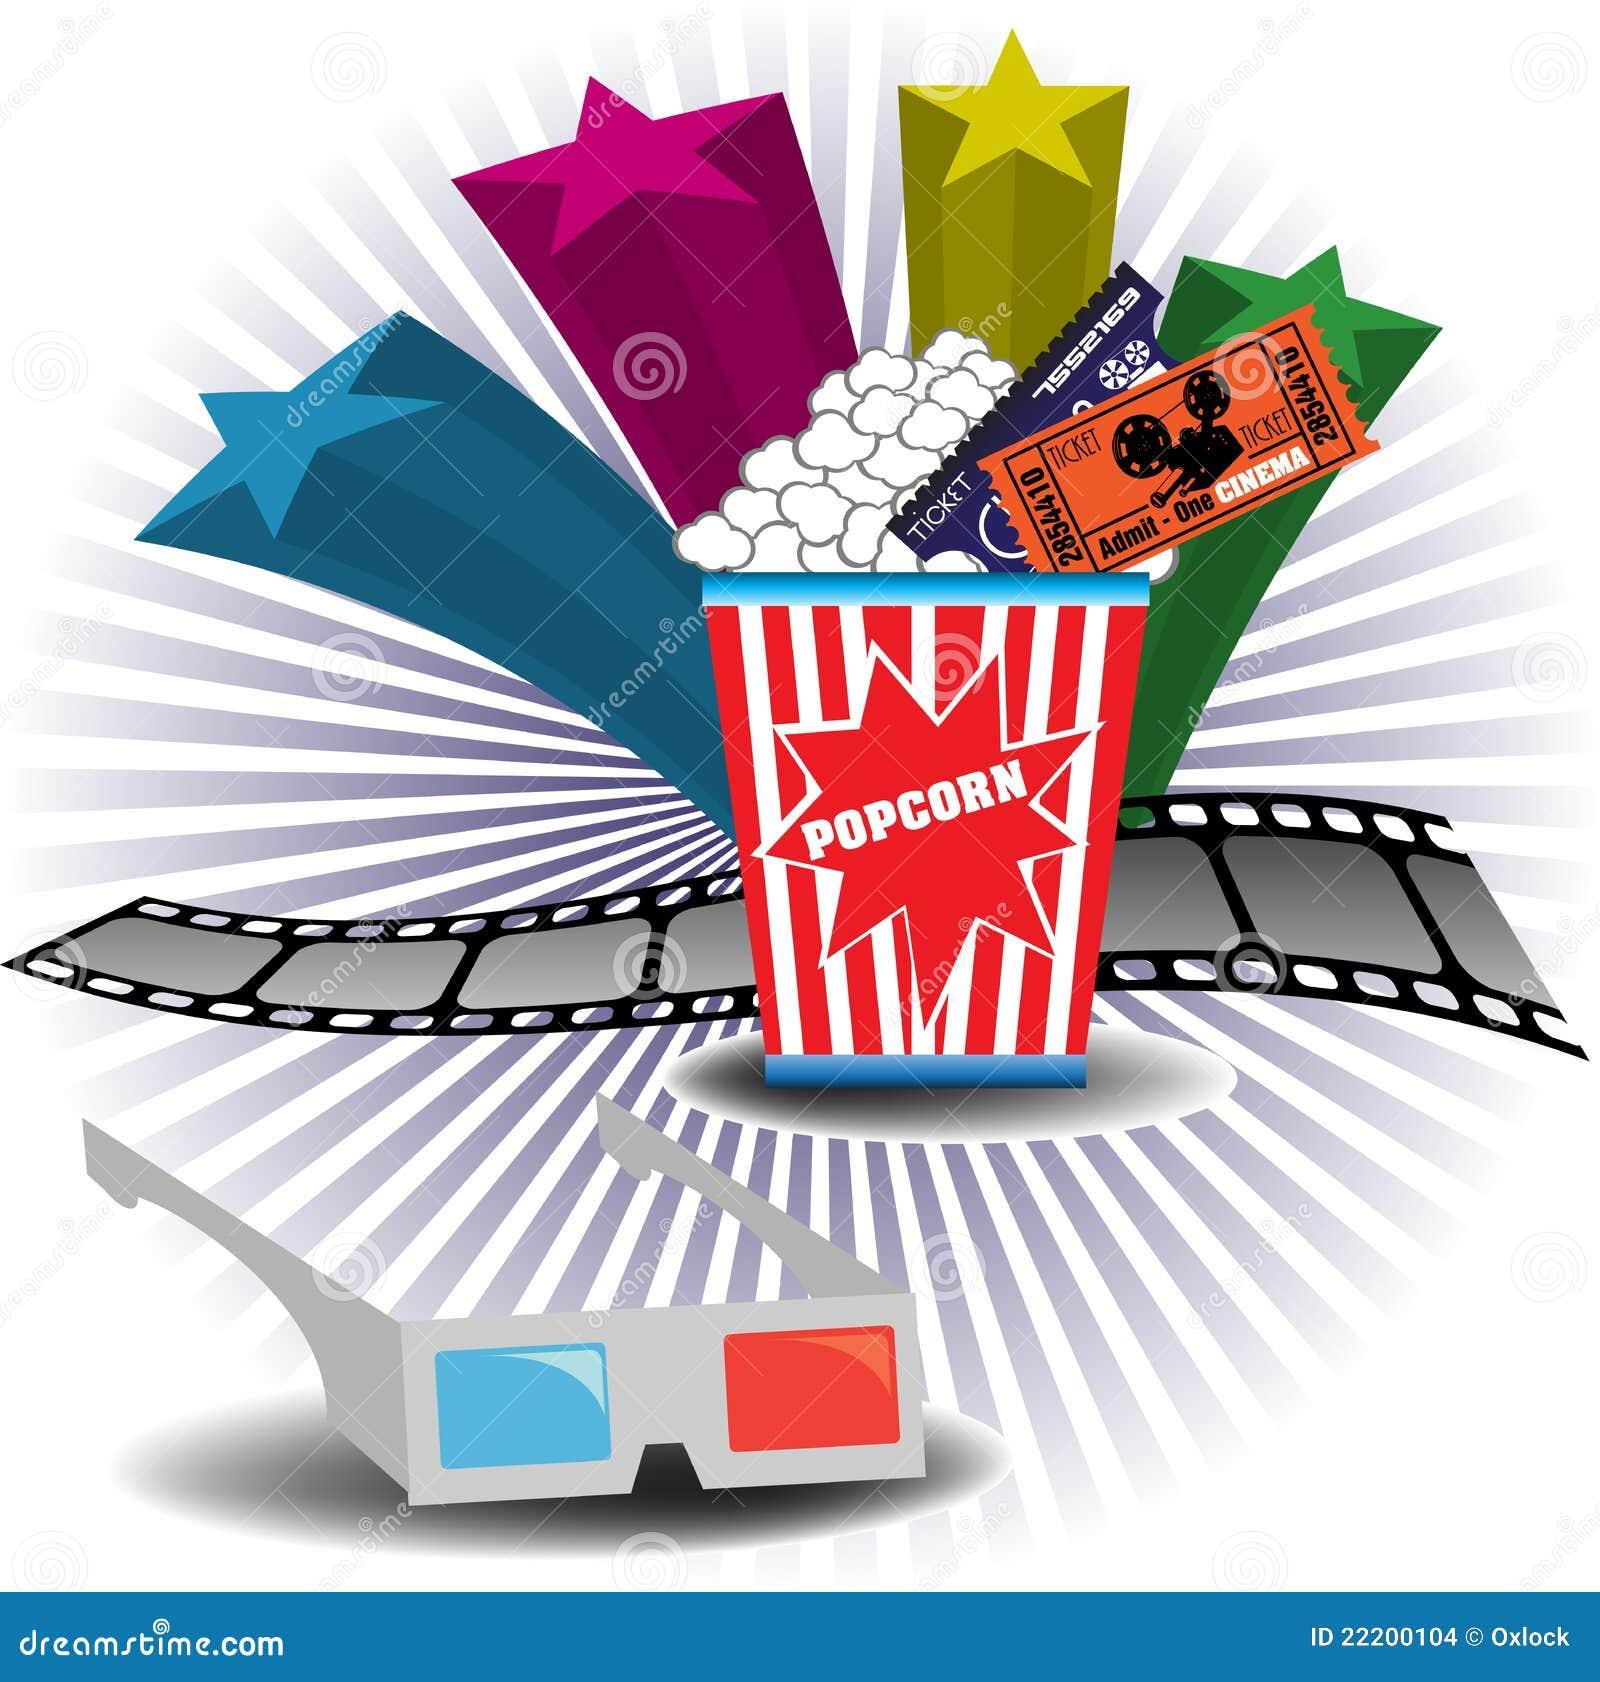 ... cinema glasses, filmstrip, popcorn and cinema tickets. Cinema theme